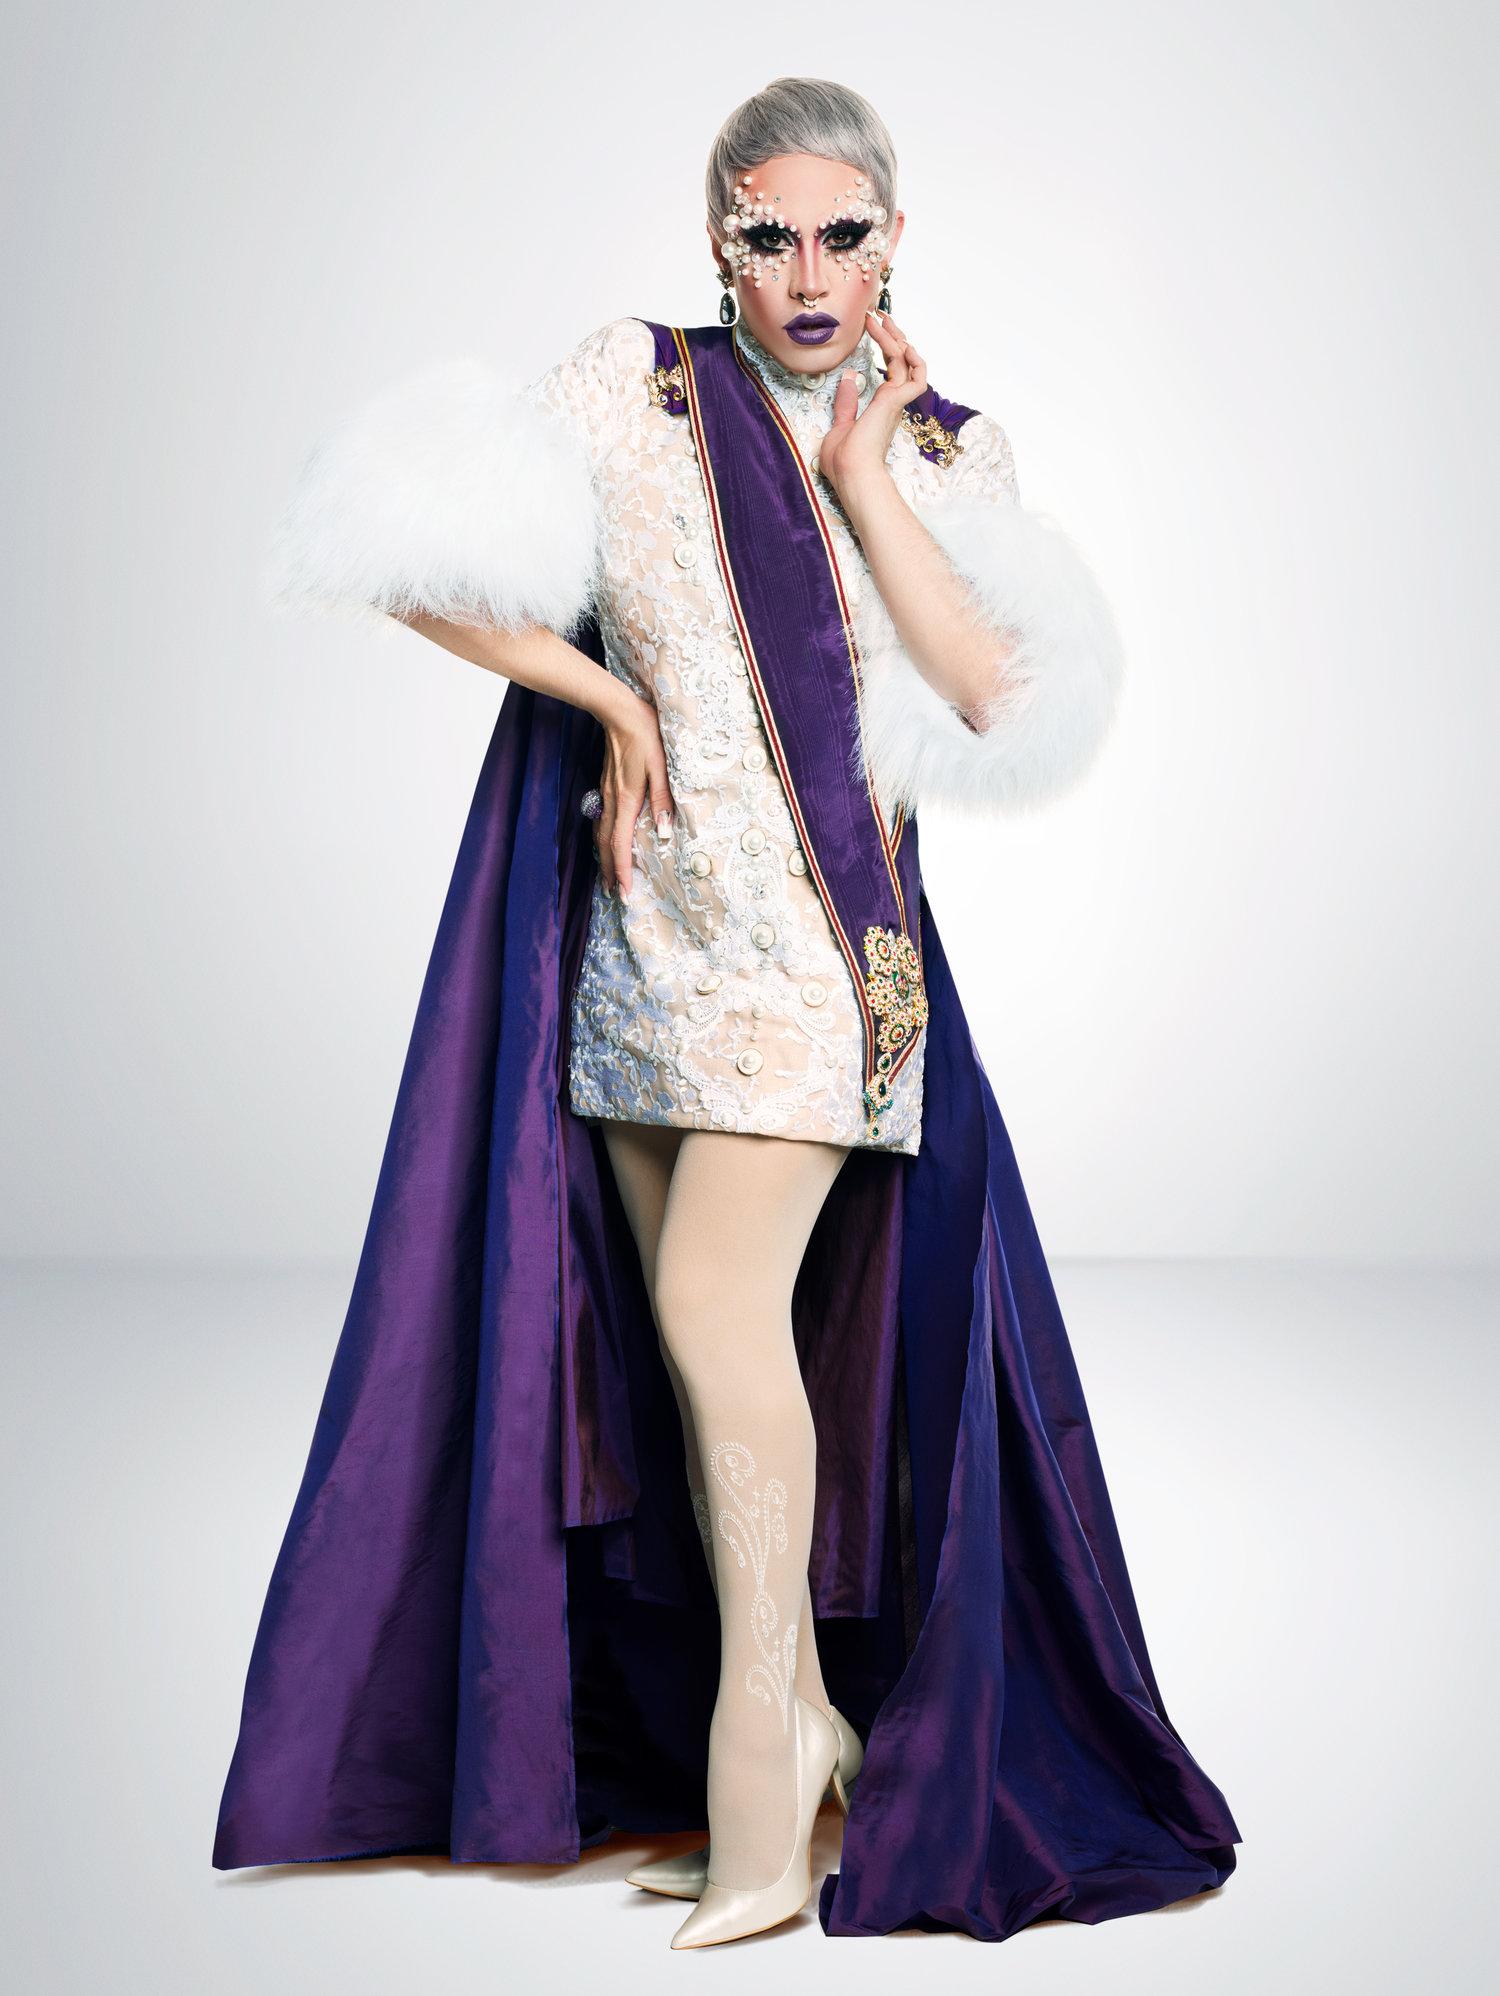 Alexis Texas Wikipedia phi phi o'hara   rupaul's drag race wiki   fandom